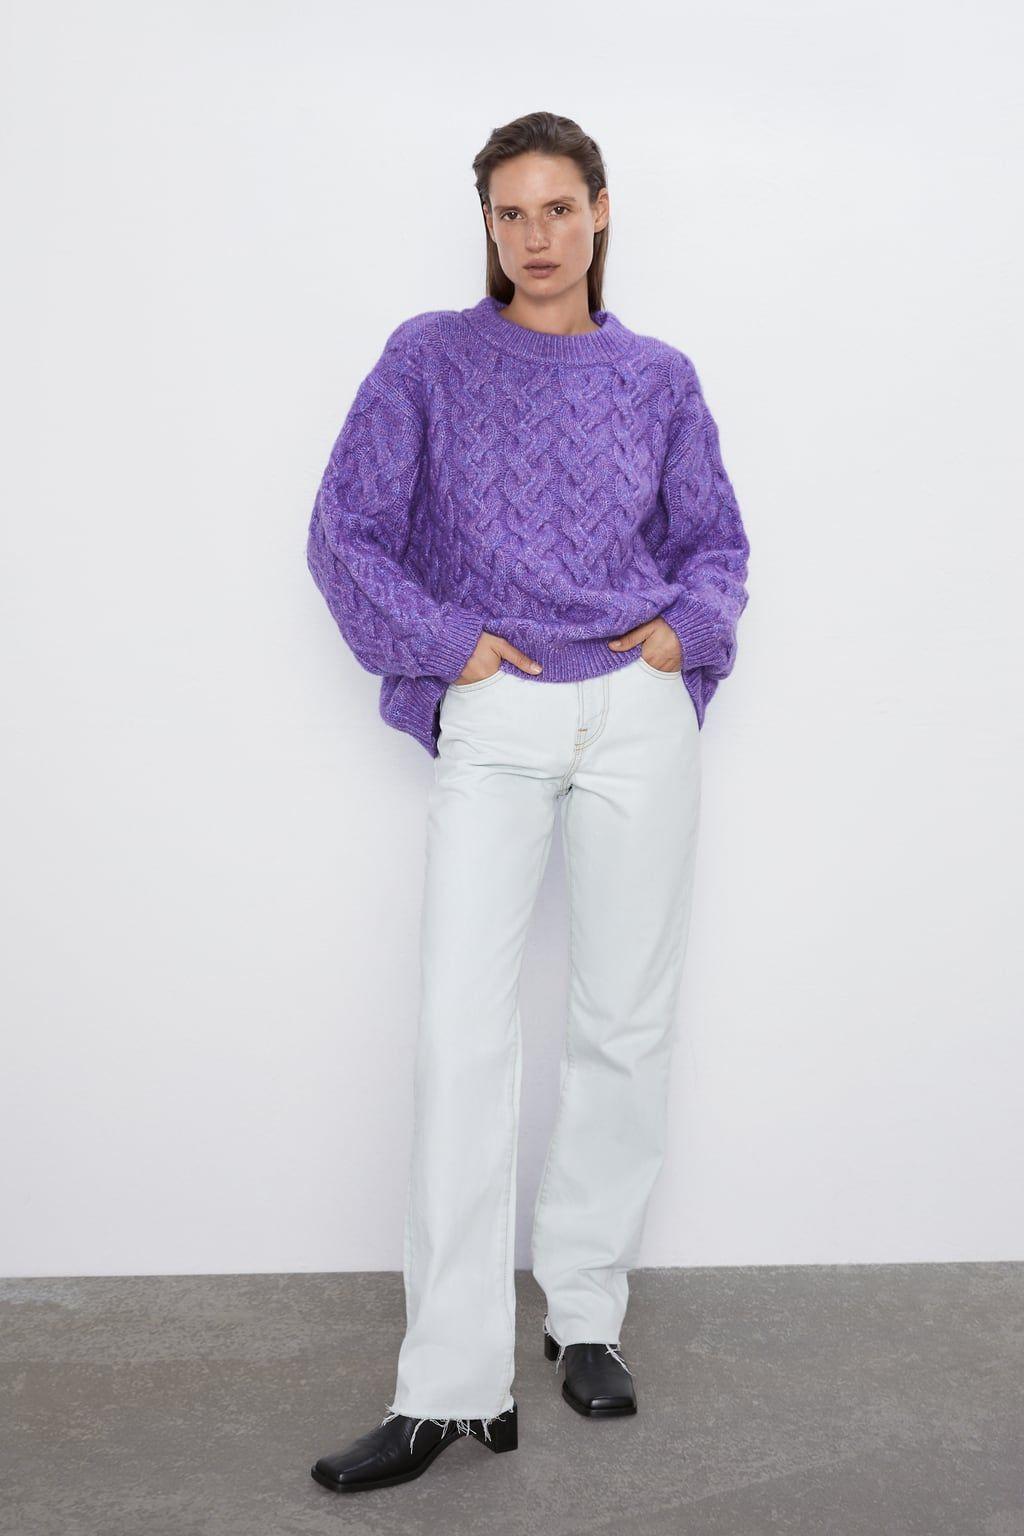 Oversized Sweater Cardigan 2015 Olivia Palermo Runway